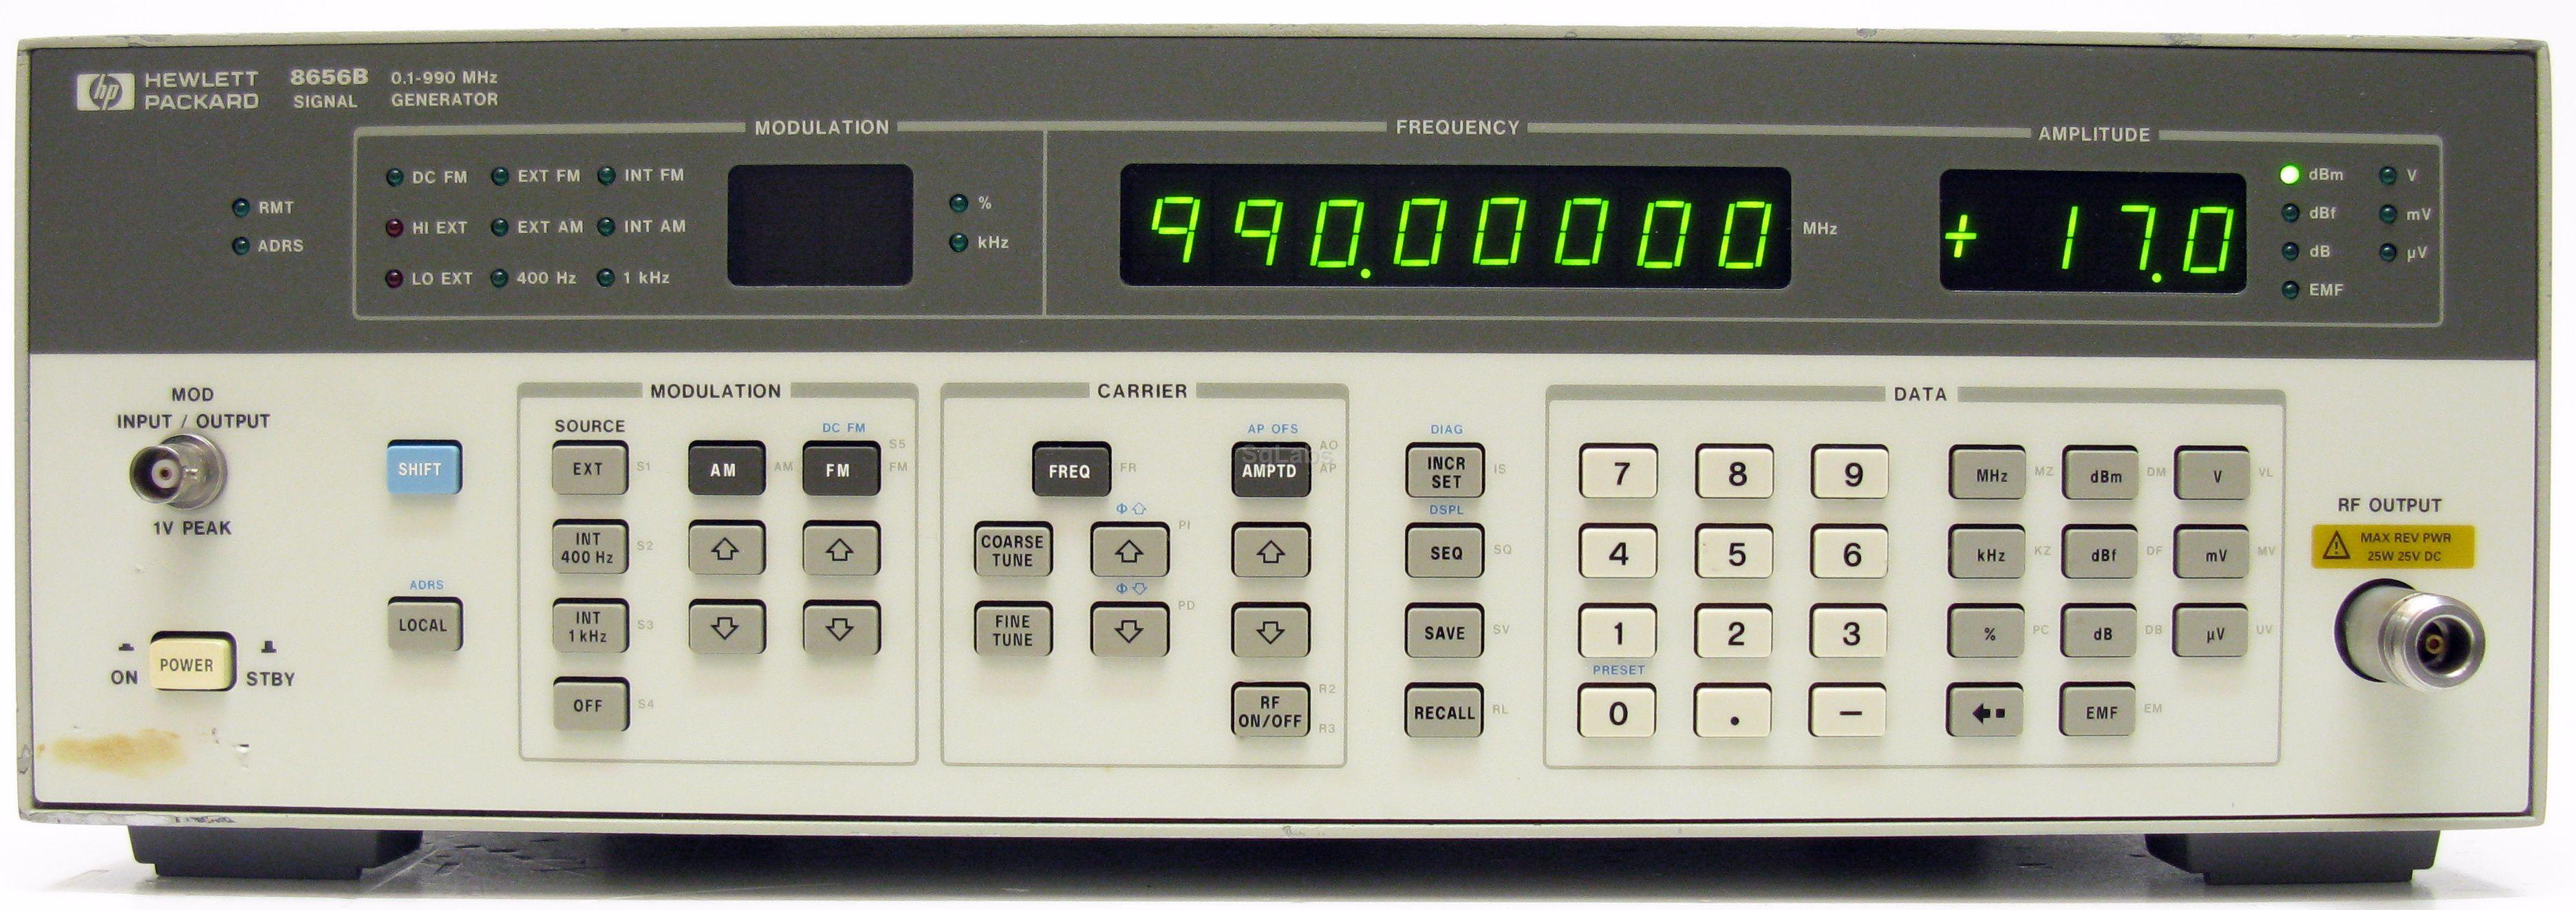 Hp Agilent Keysight 8656b